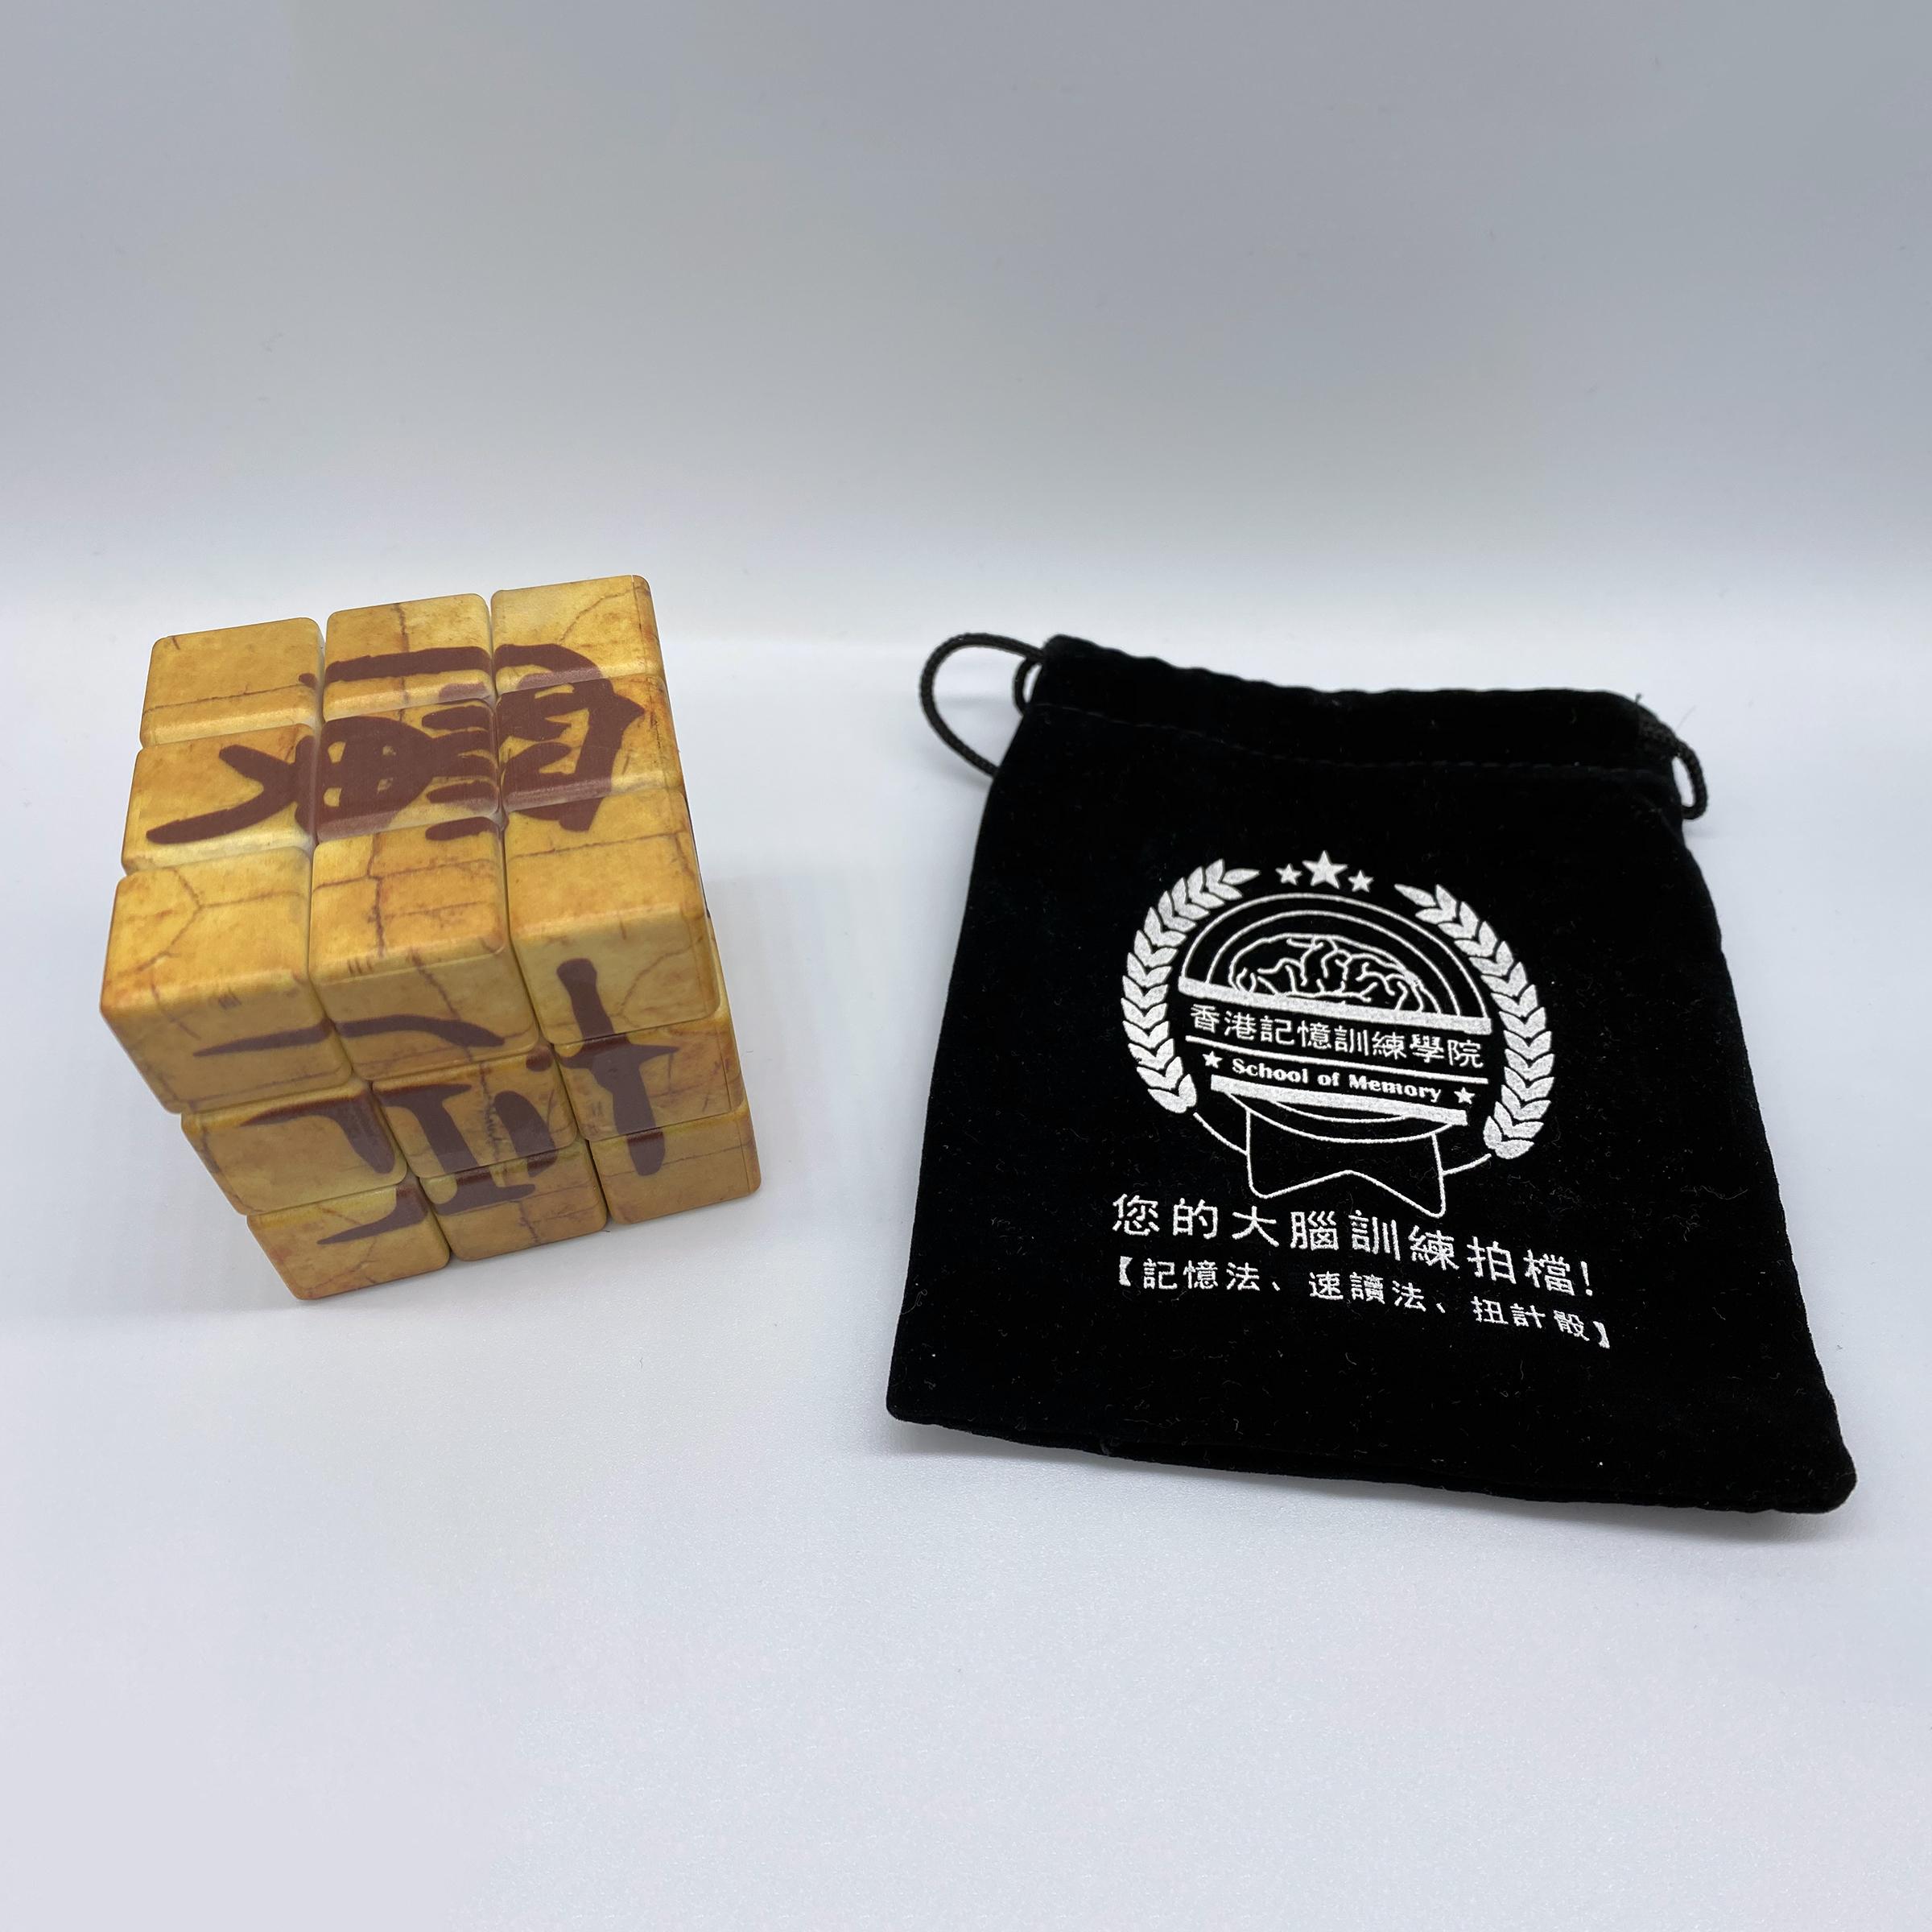 3x3 Rubik (Totem) 3X3 扭計骰 (圖騰)